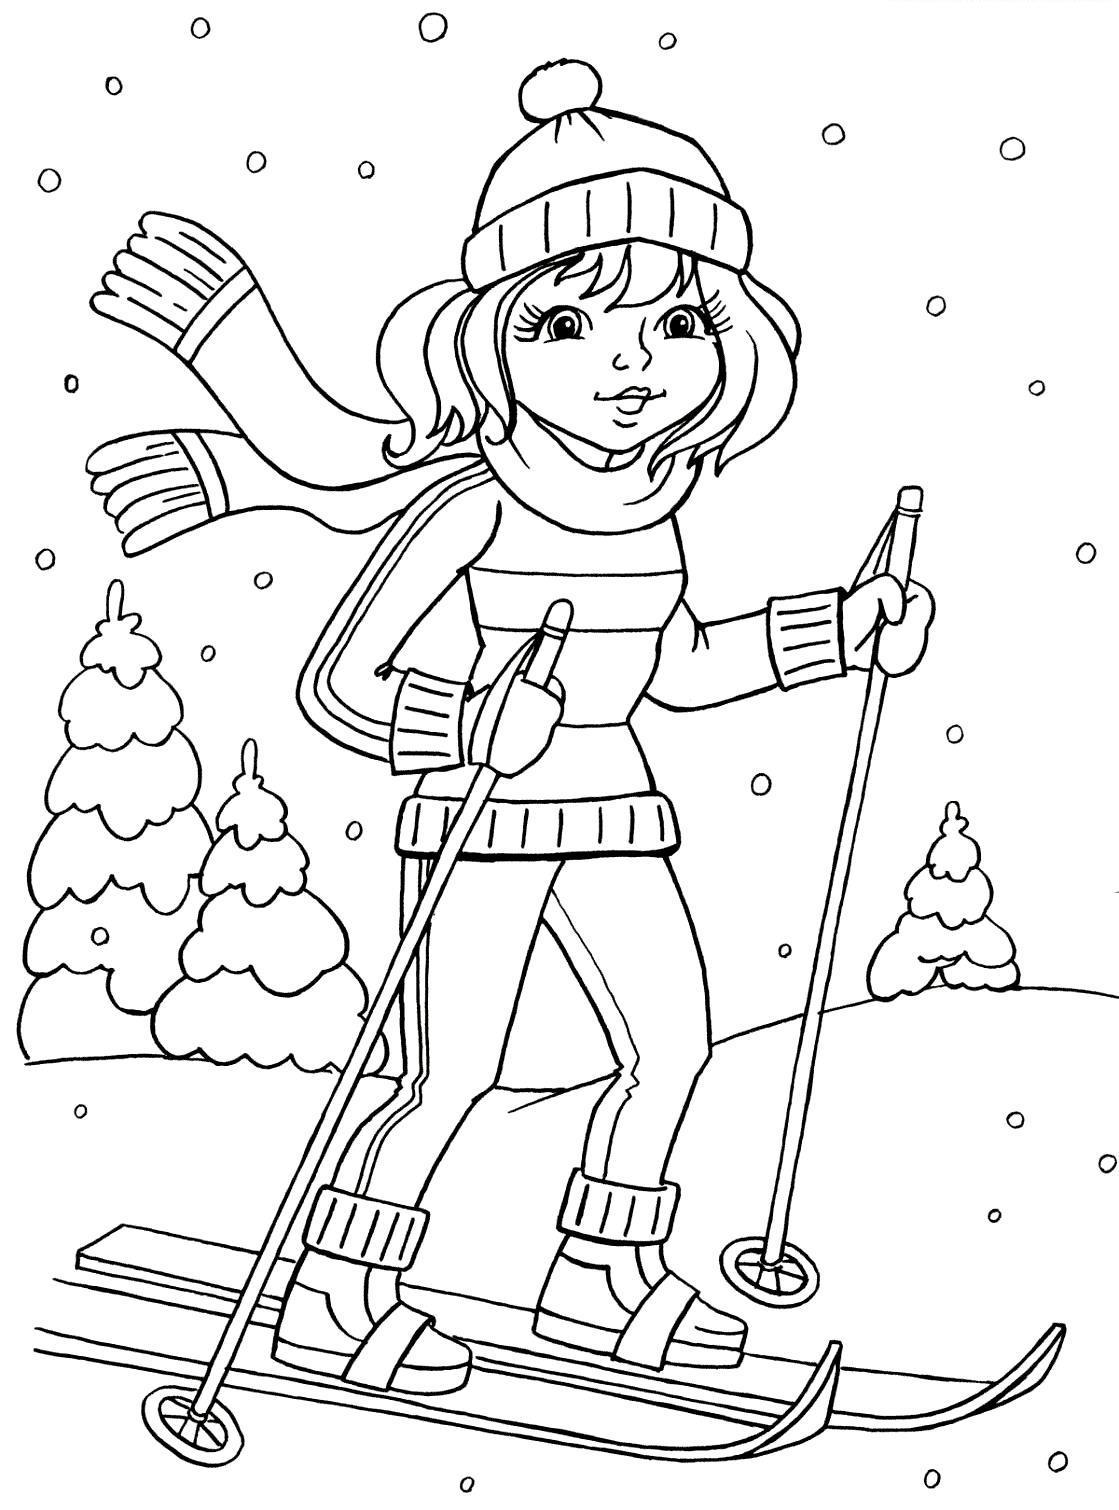 Зимний спорт раскраски для детей